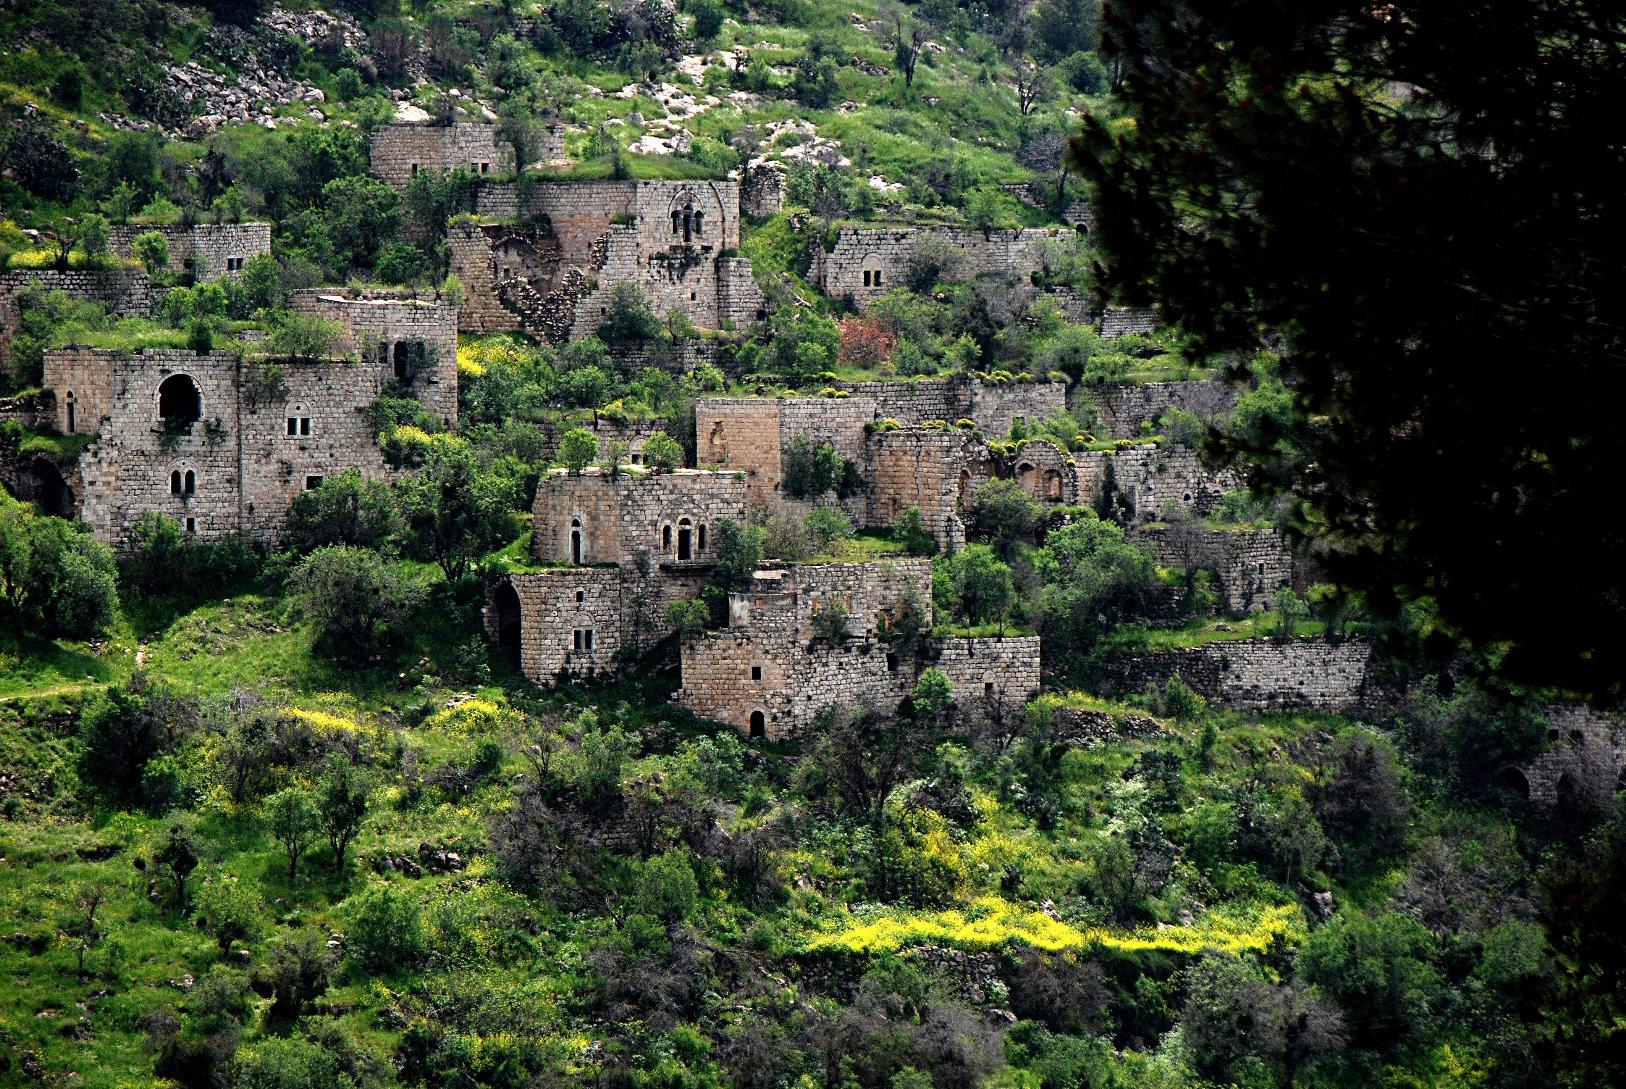 The old village of Lifta on the outskirts of Jerusalem. Photo by Yehudit Eliaf